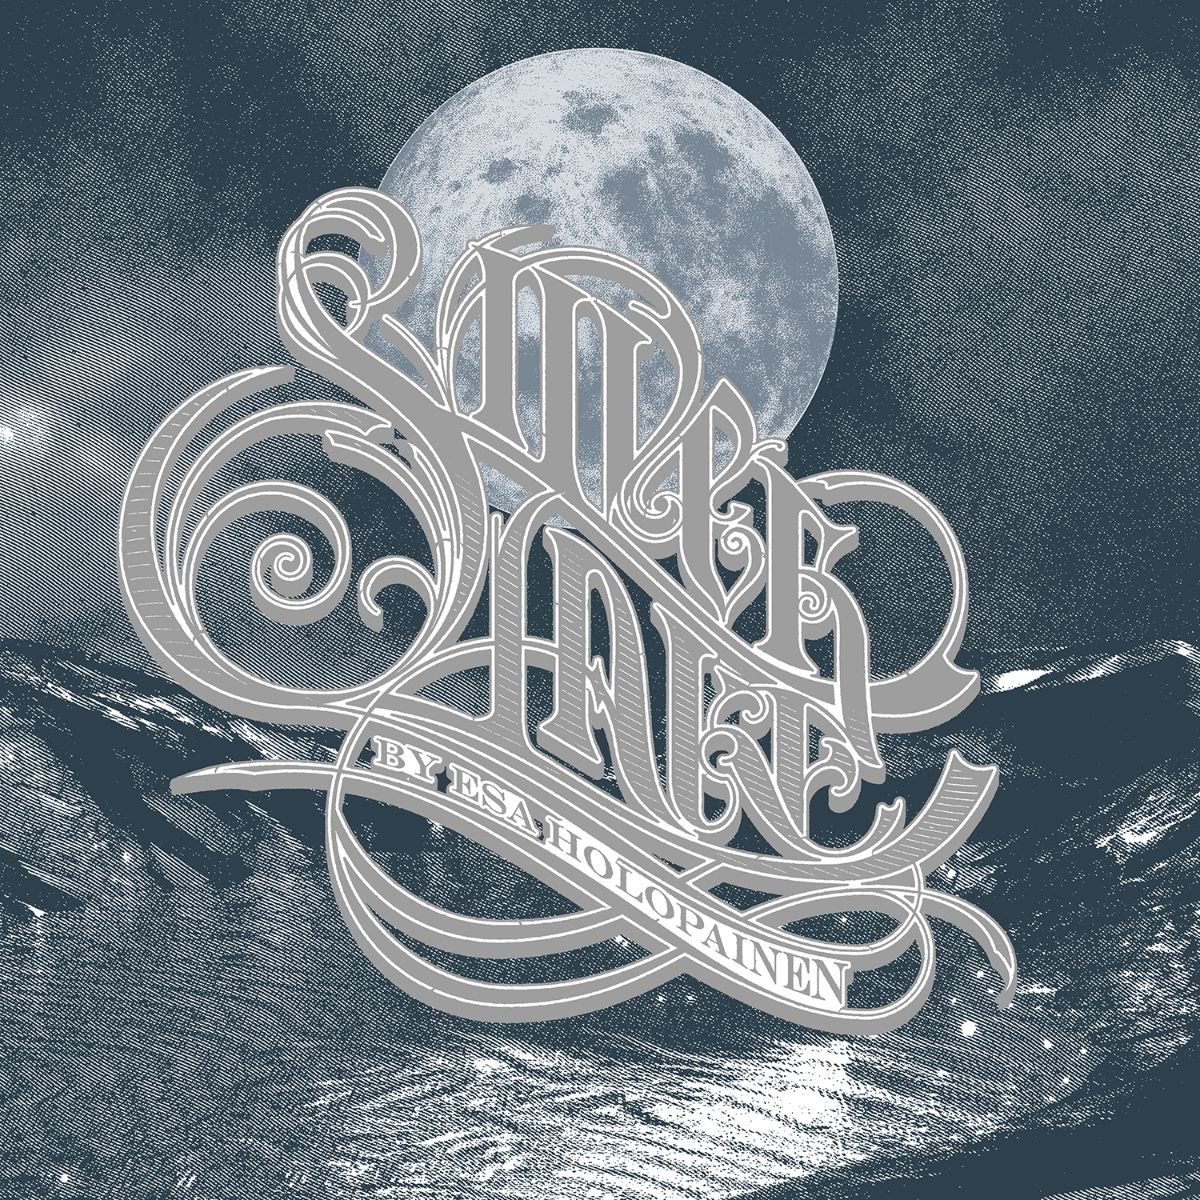 silver-lake-by-esa-holopainen-review-zum-debutsoloalbum-des-amorphis-gitarristen